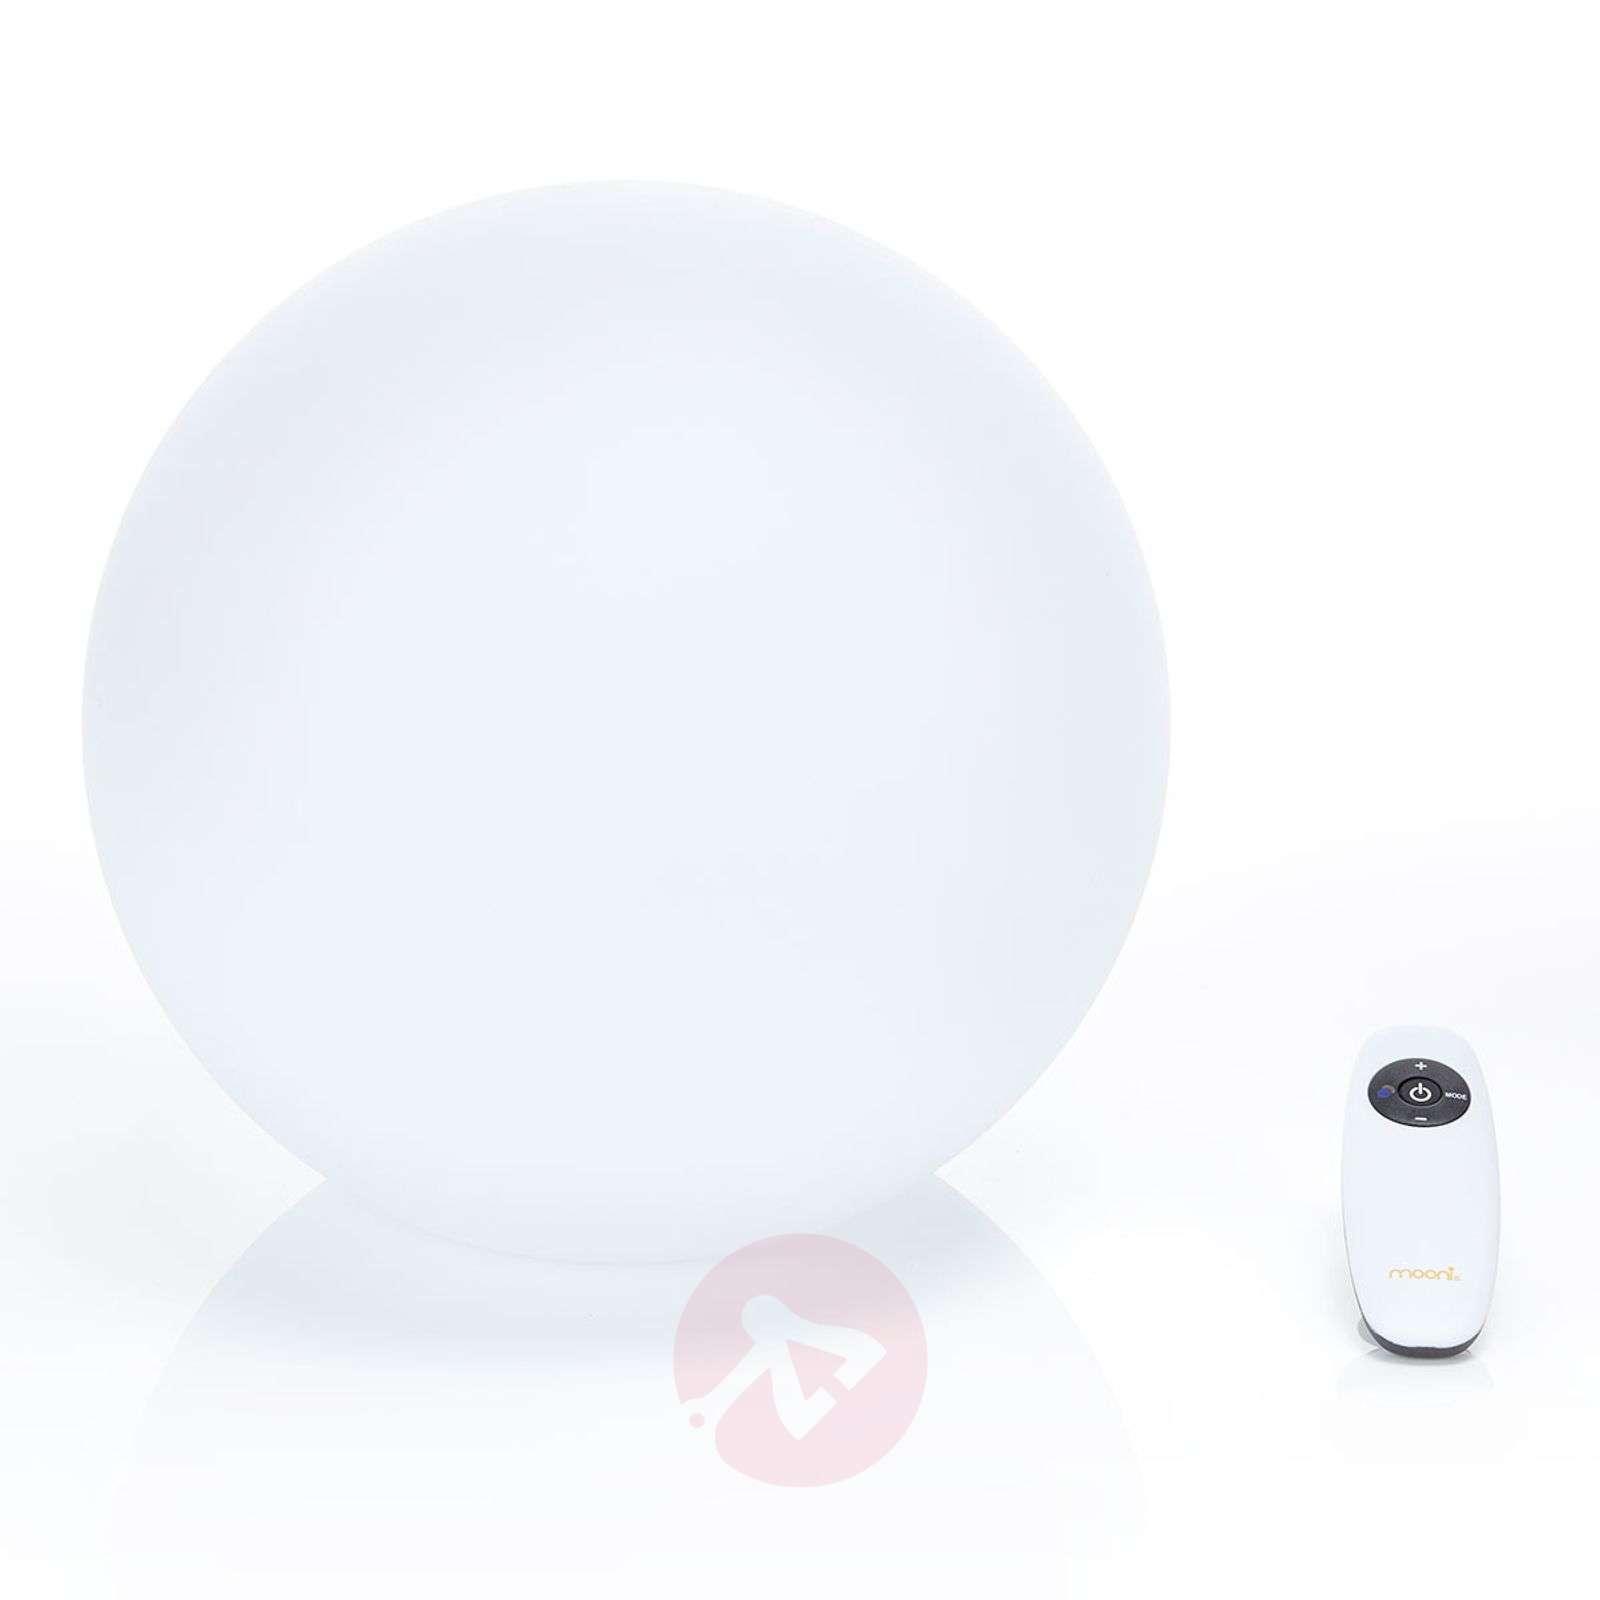 LED-koristeulkovalaisin Tomila, kuula, USB, 30 cm-6729006-01